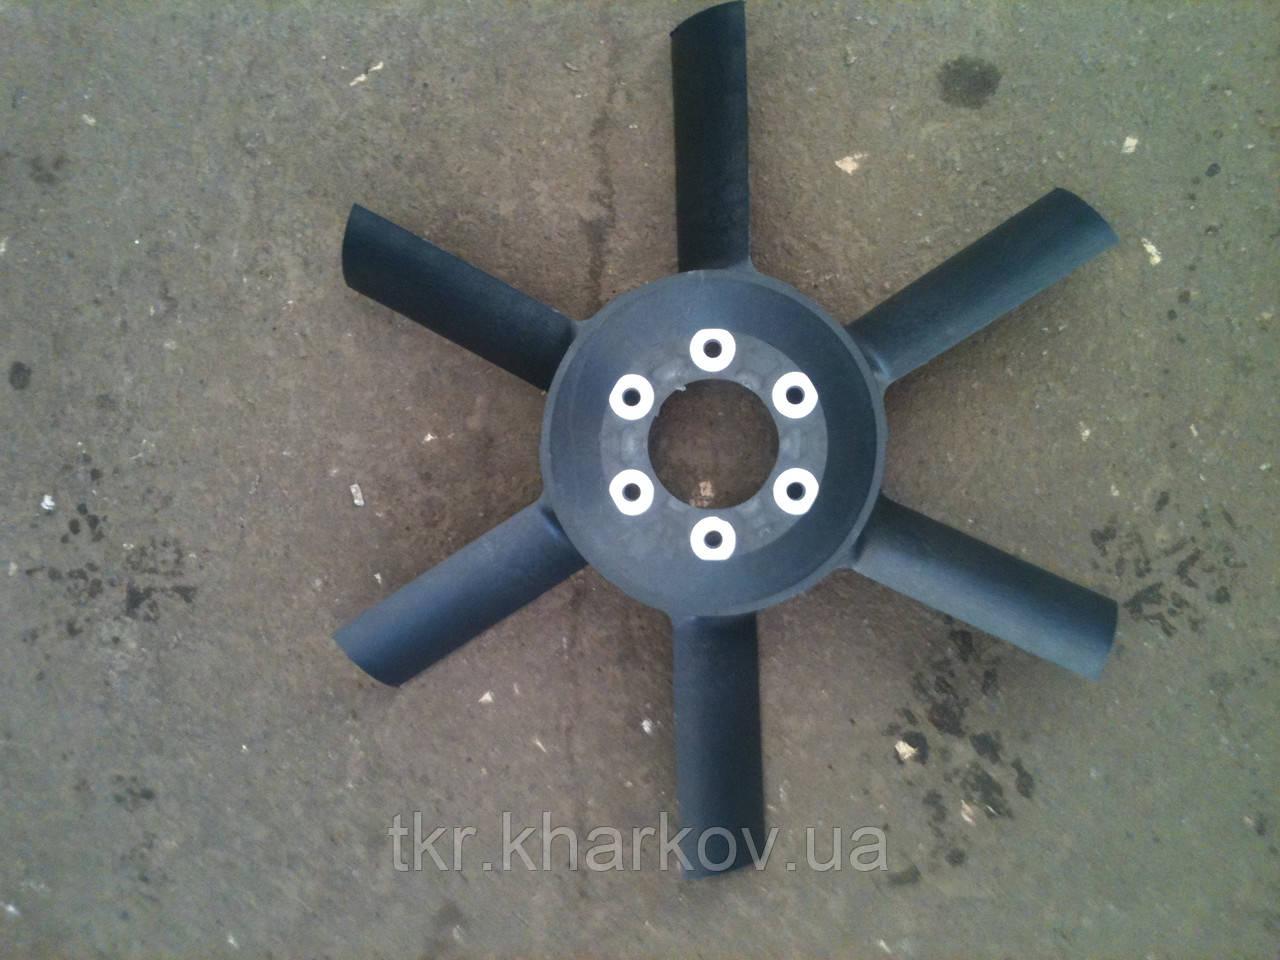 Вентилятор радиатора МТЗ (245-1308010)